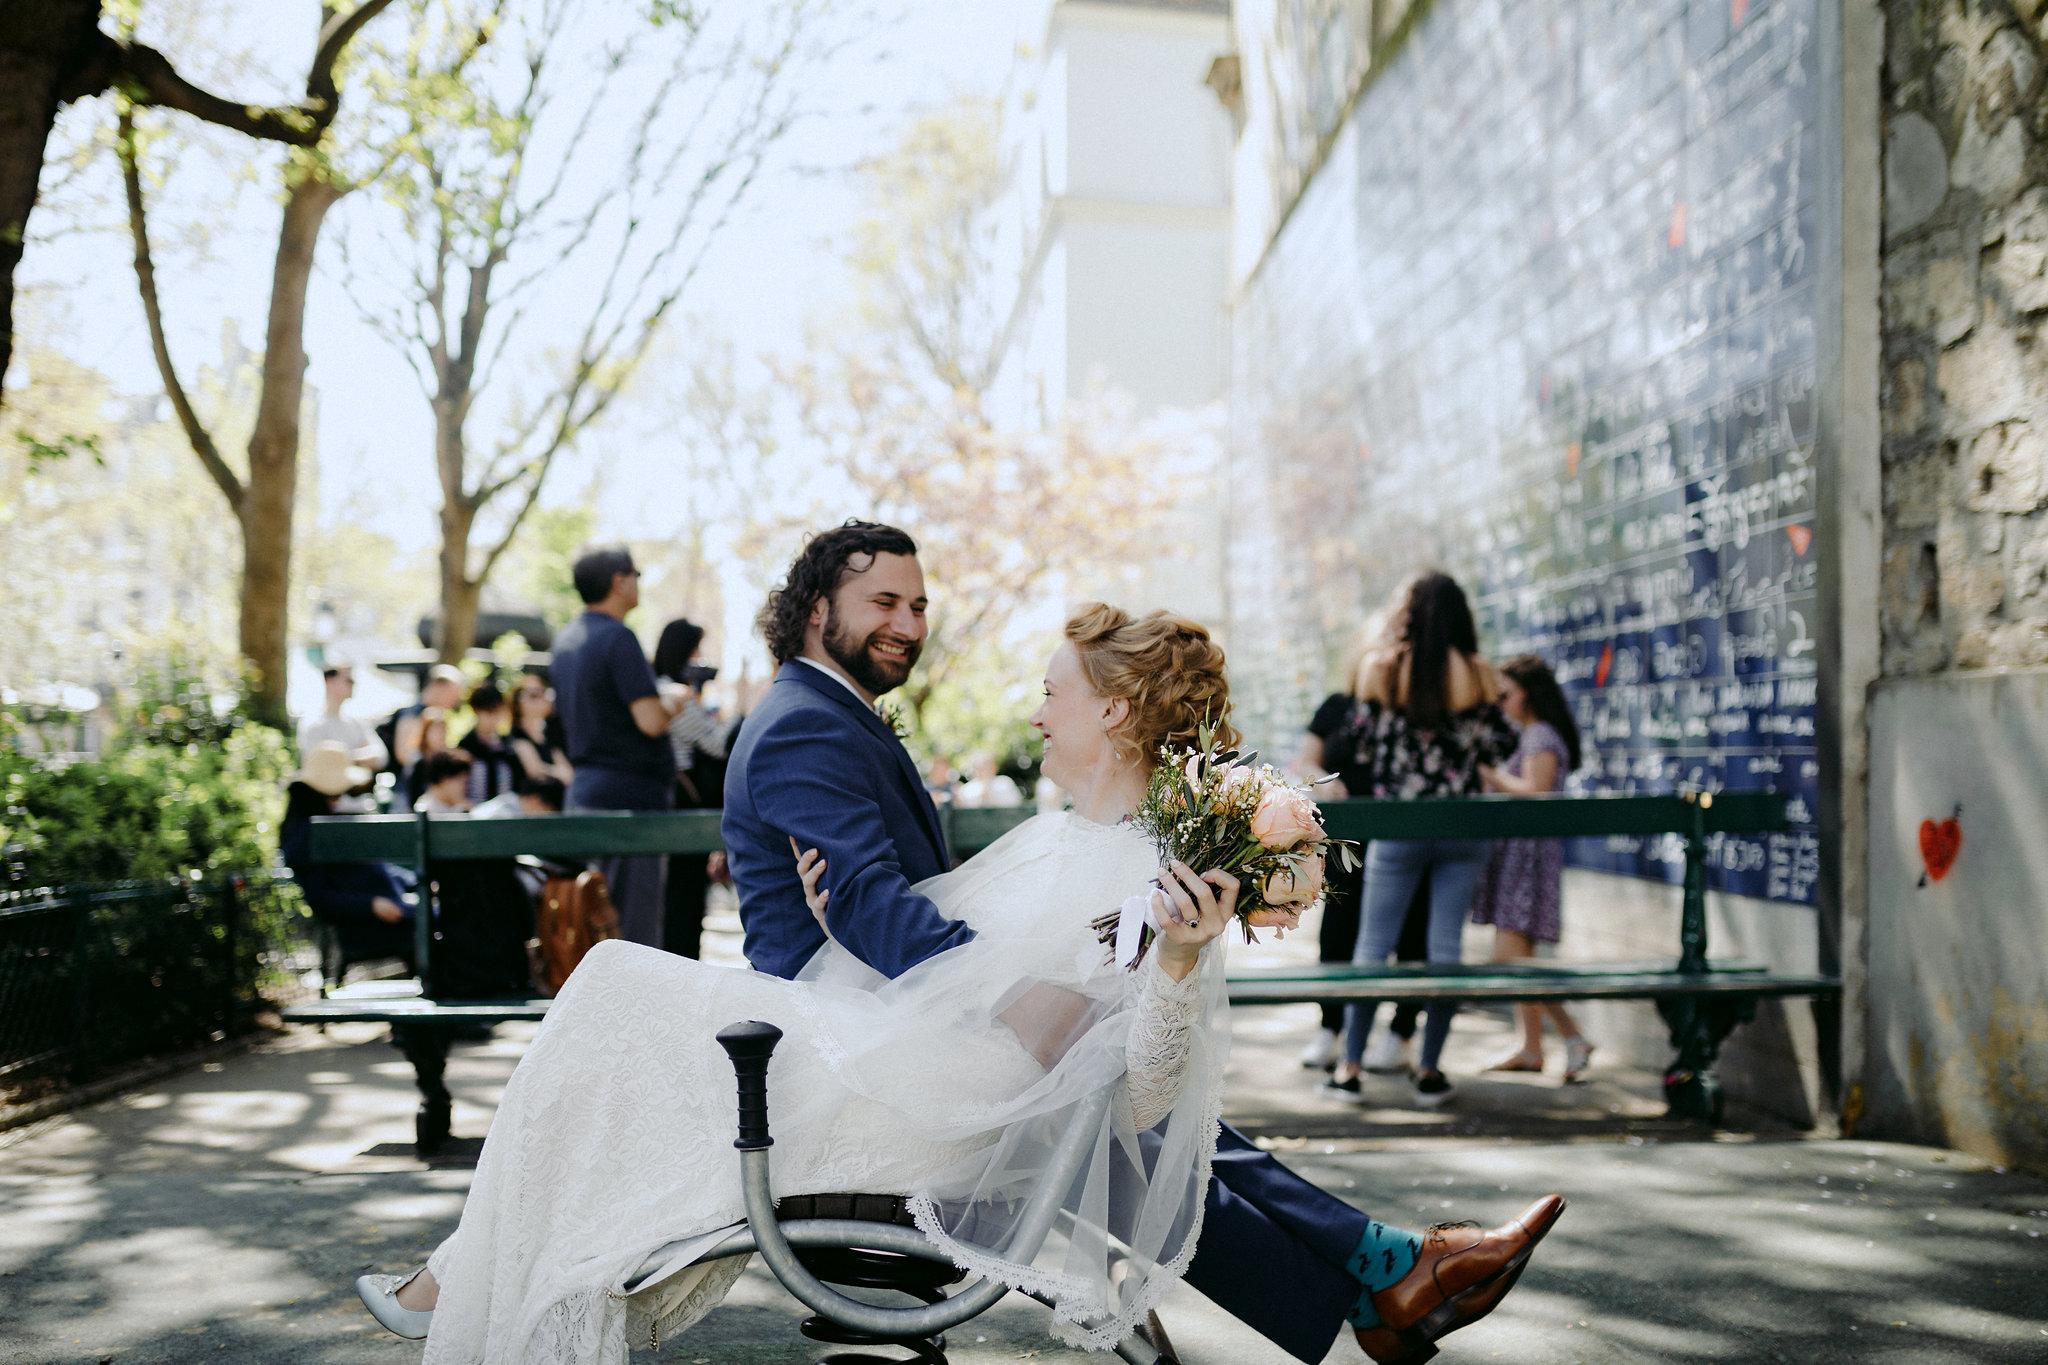 Paris_elopement_wedding_photographer-351.jpg